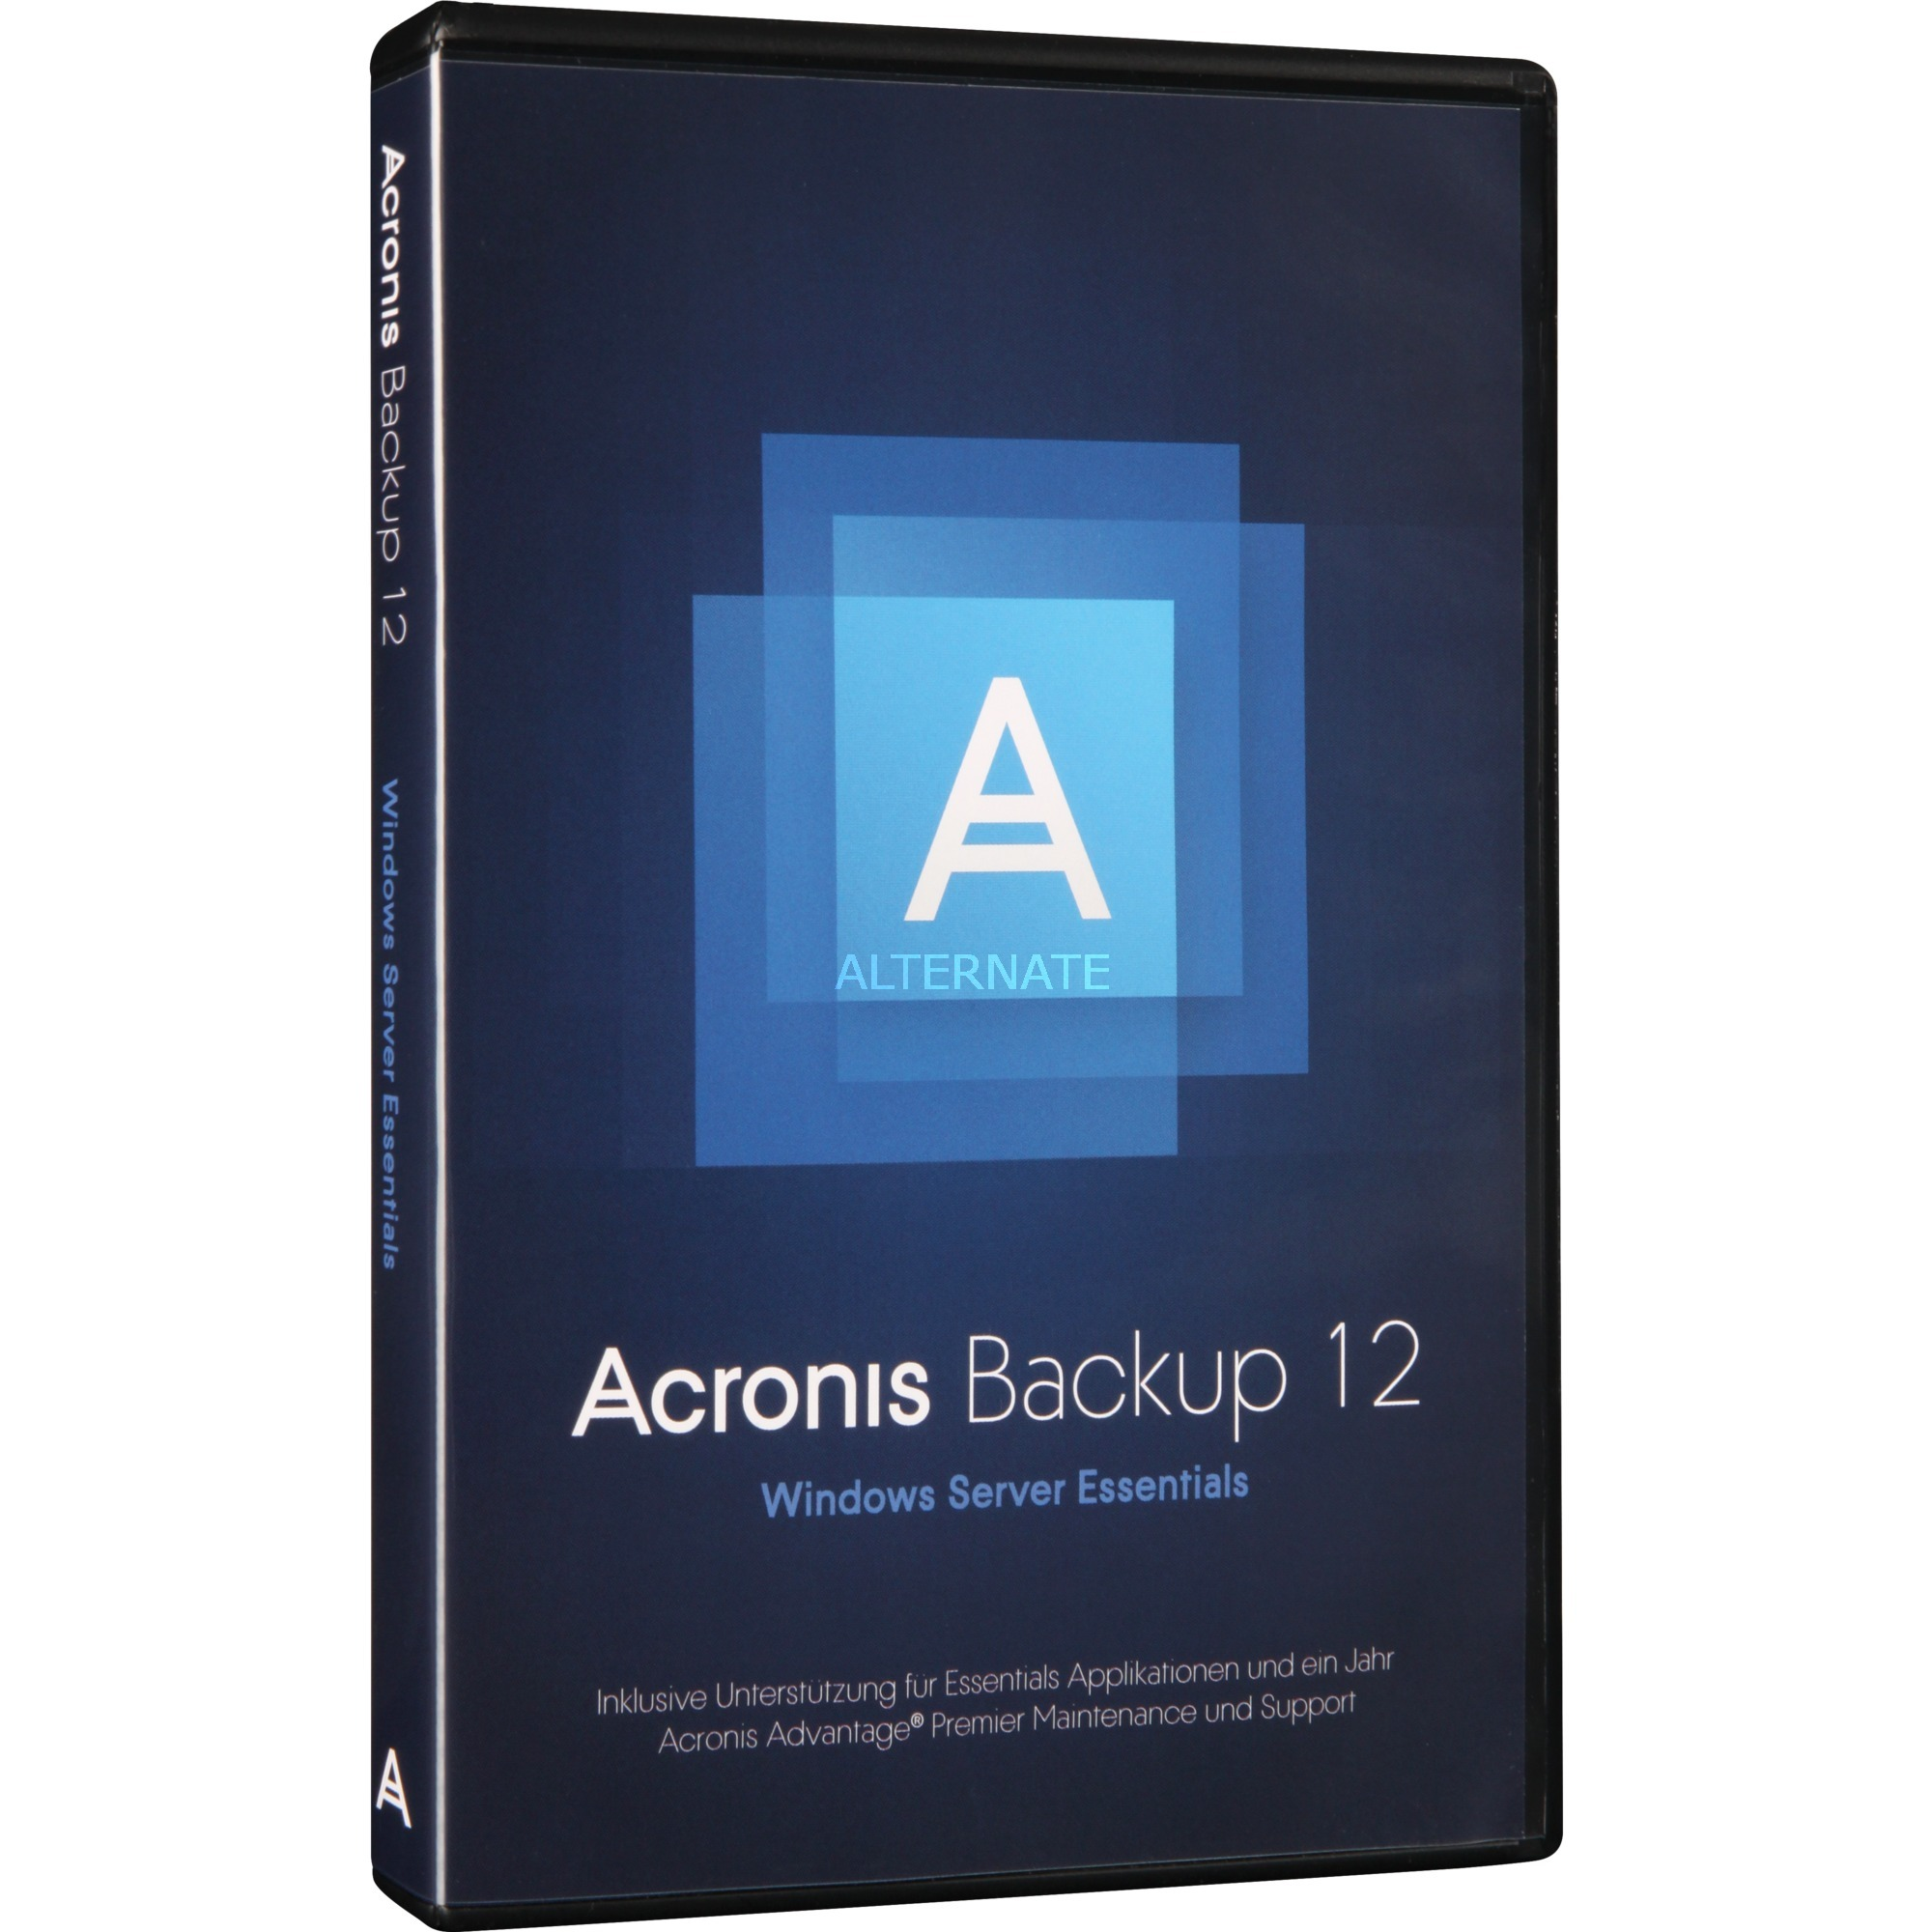 backup-12-windows-server-essentials-software